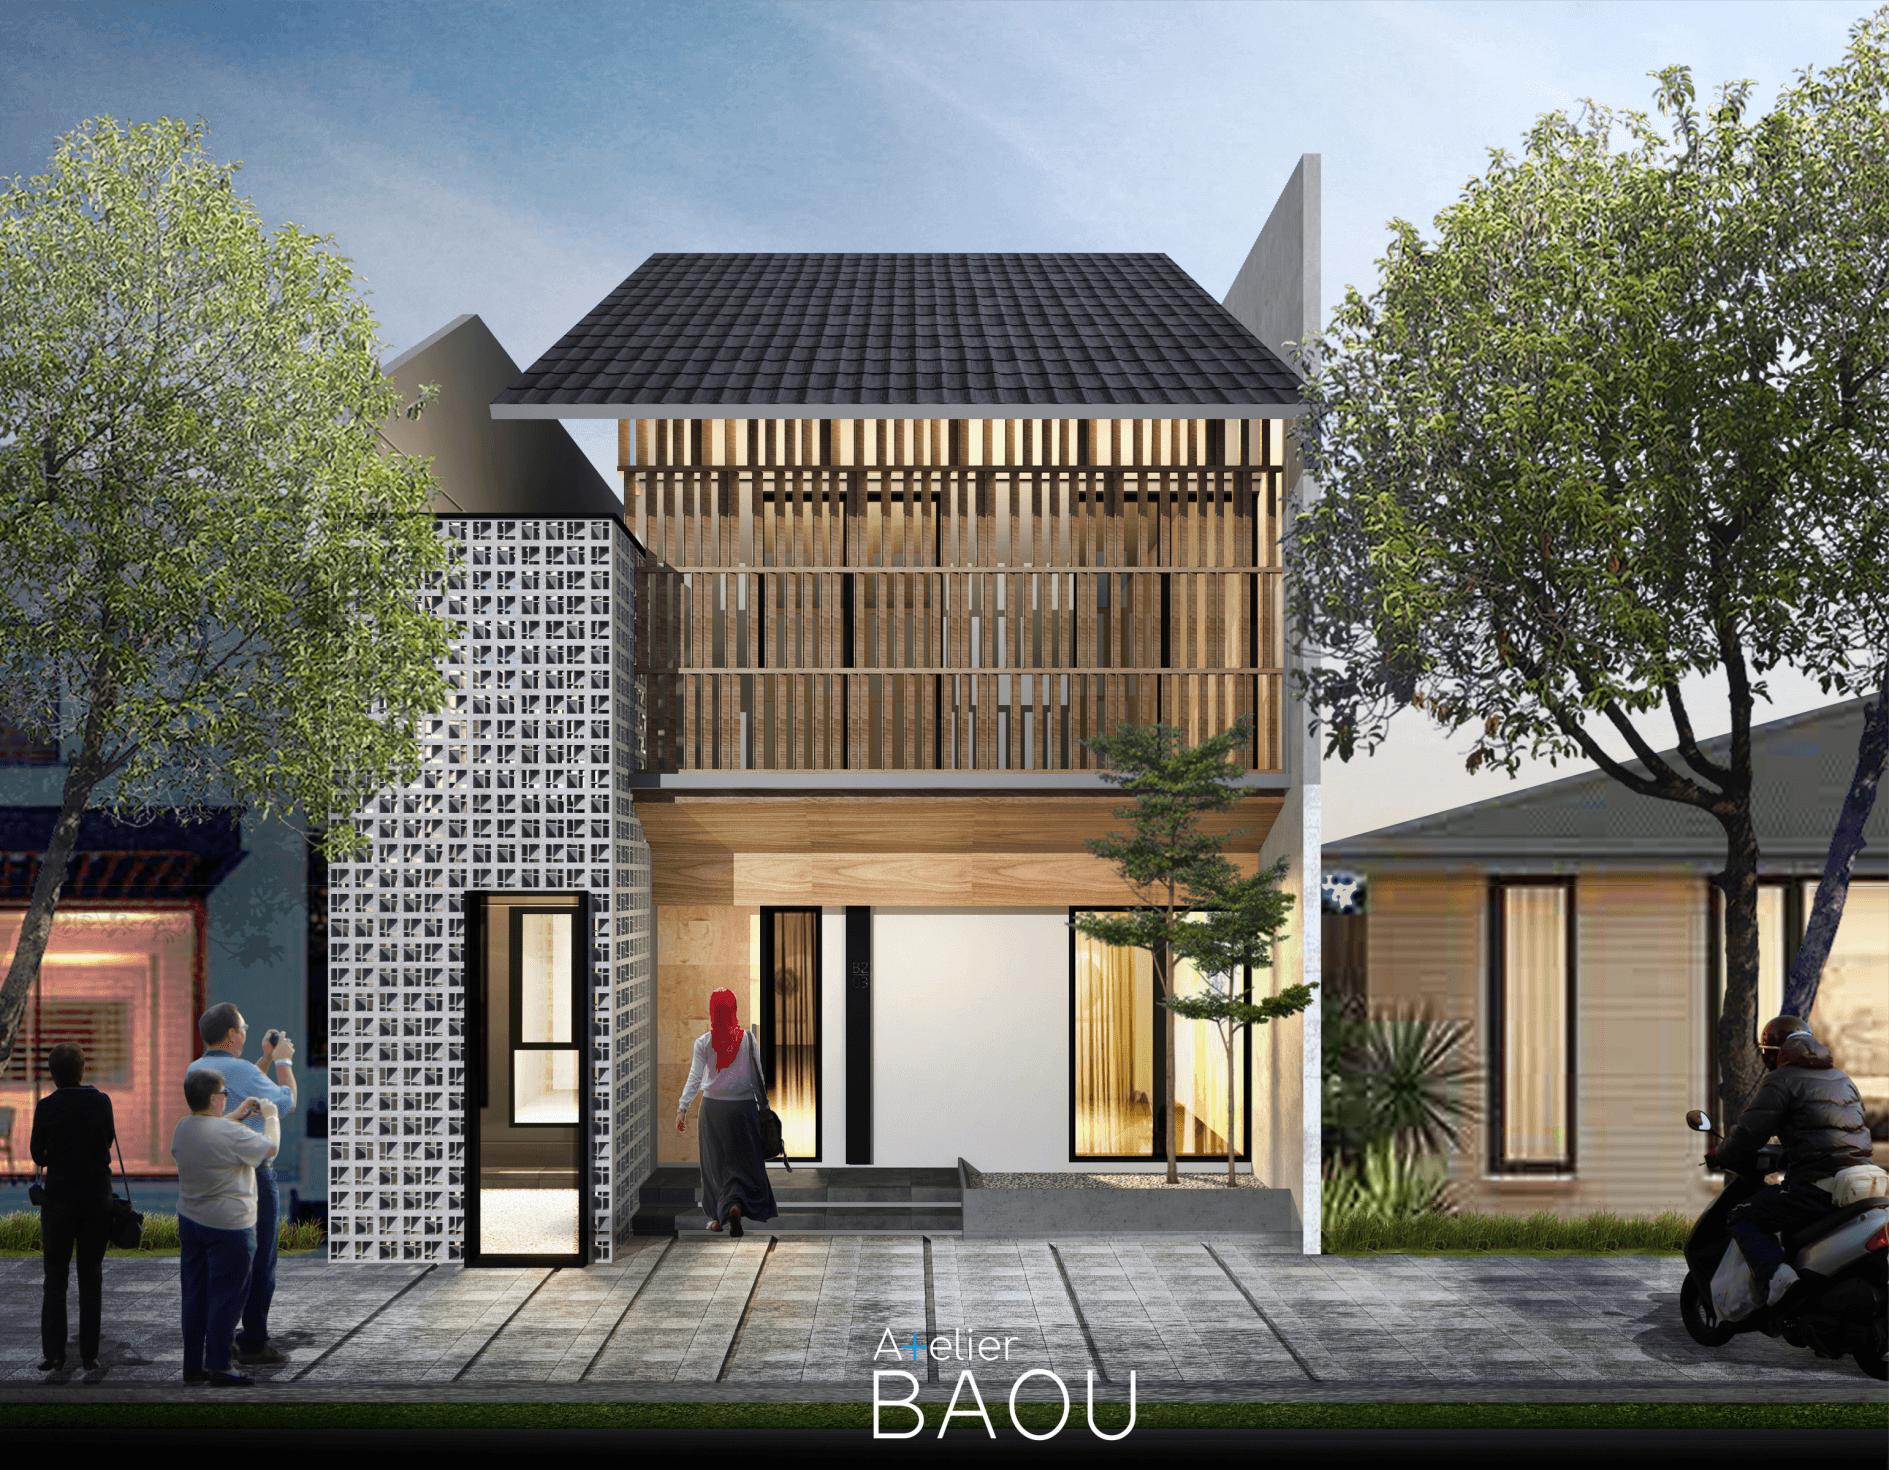 Atelier Baou Y House Cikarang, Bekasi, Jawa Barat, Indonesia Cikarang, Bekasi, Jawa Barat, Indonesia Atelier-Baou-Y-House   86452